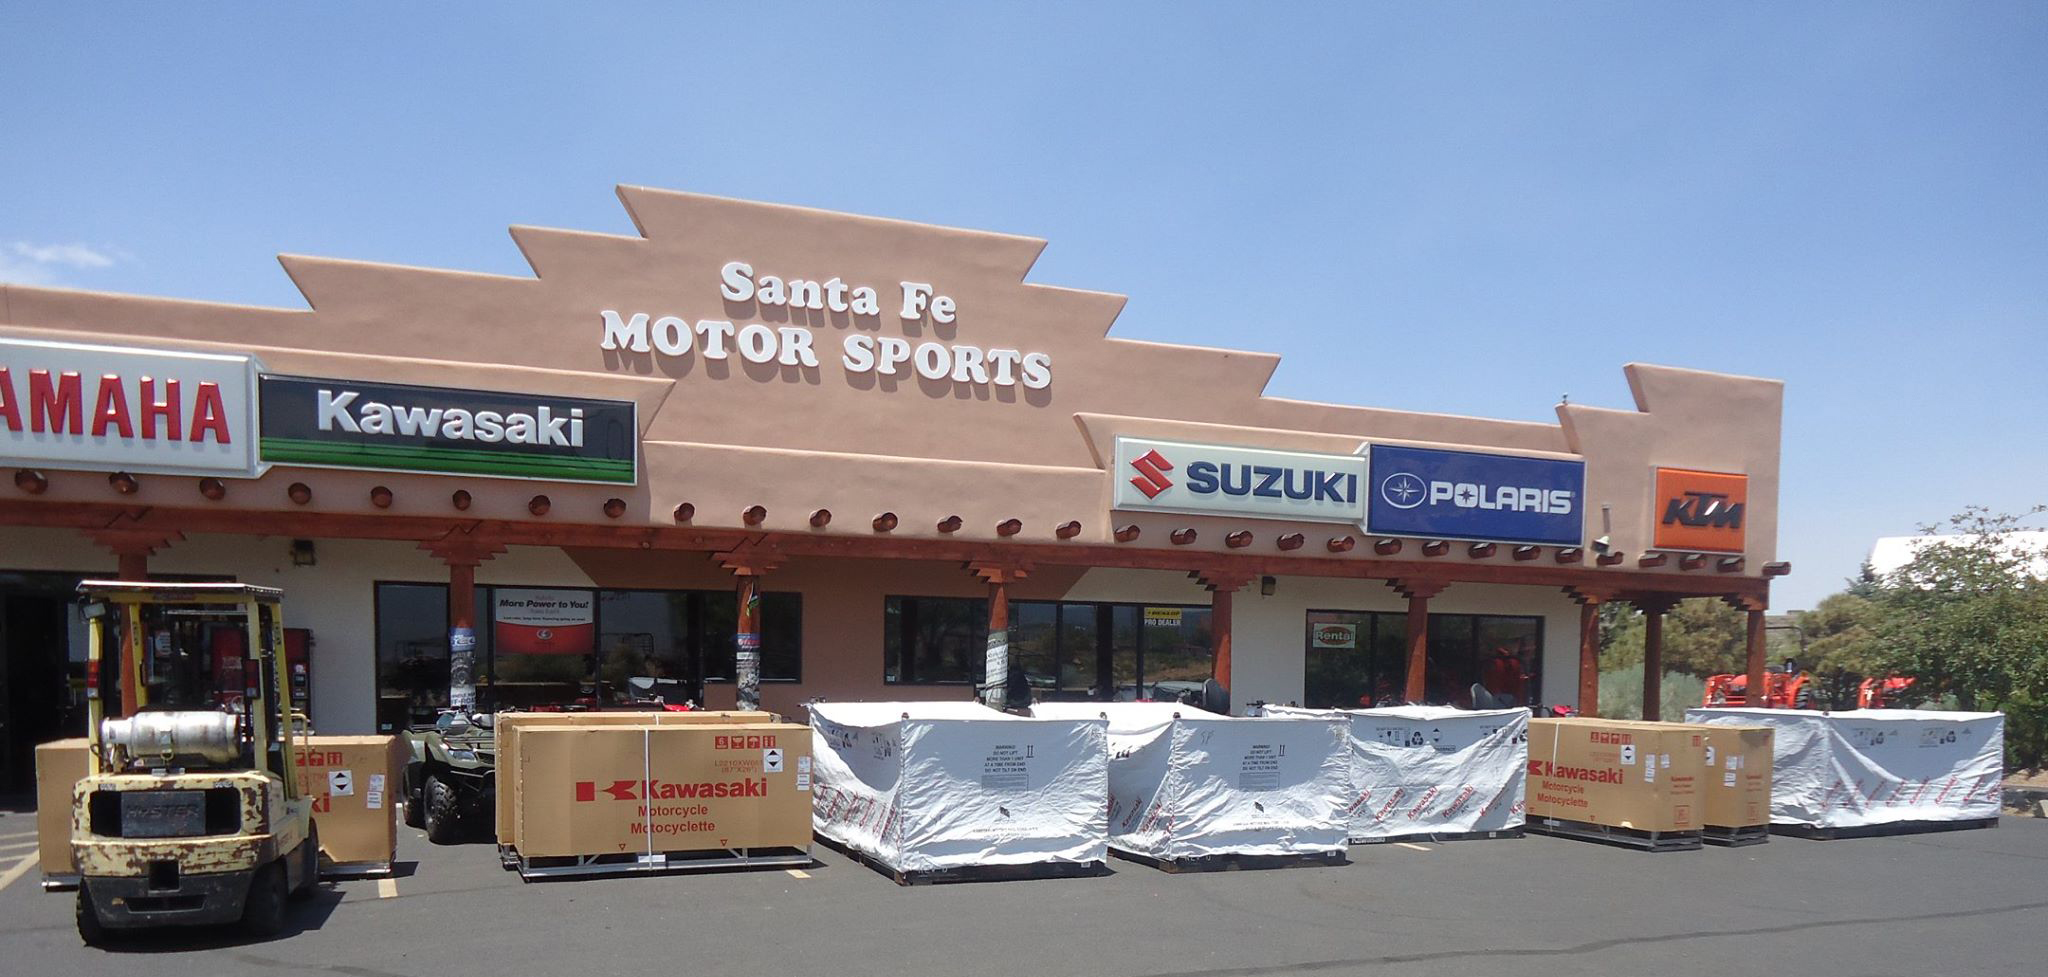 Santa Fe Motorsports sells Yamaha, Polaris, Kawasaki, Suzuki, KTM and Kabota Tractors